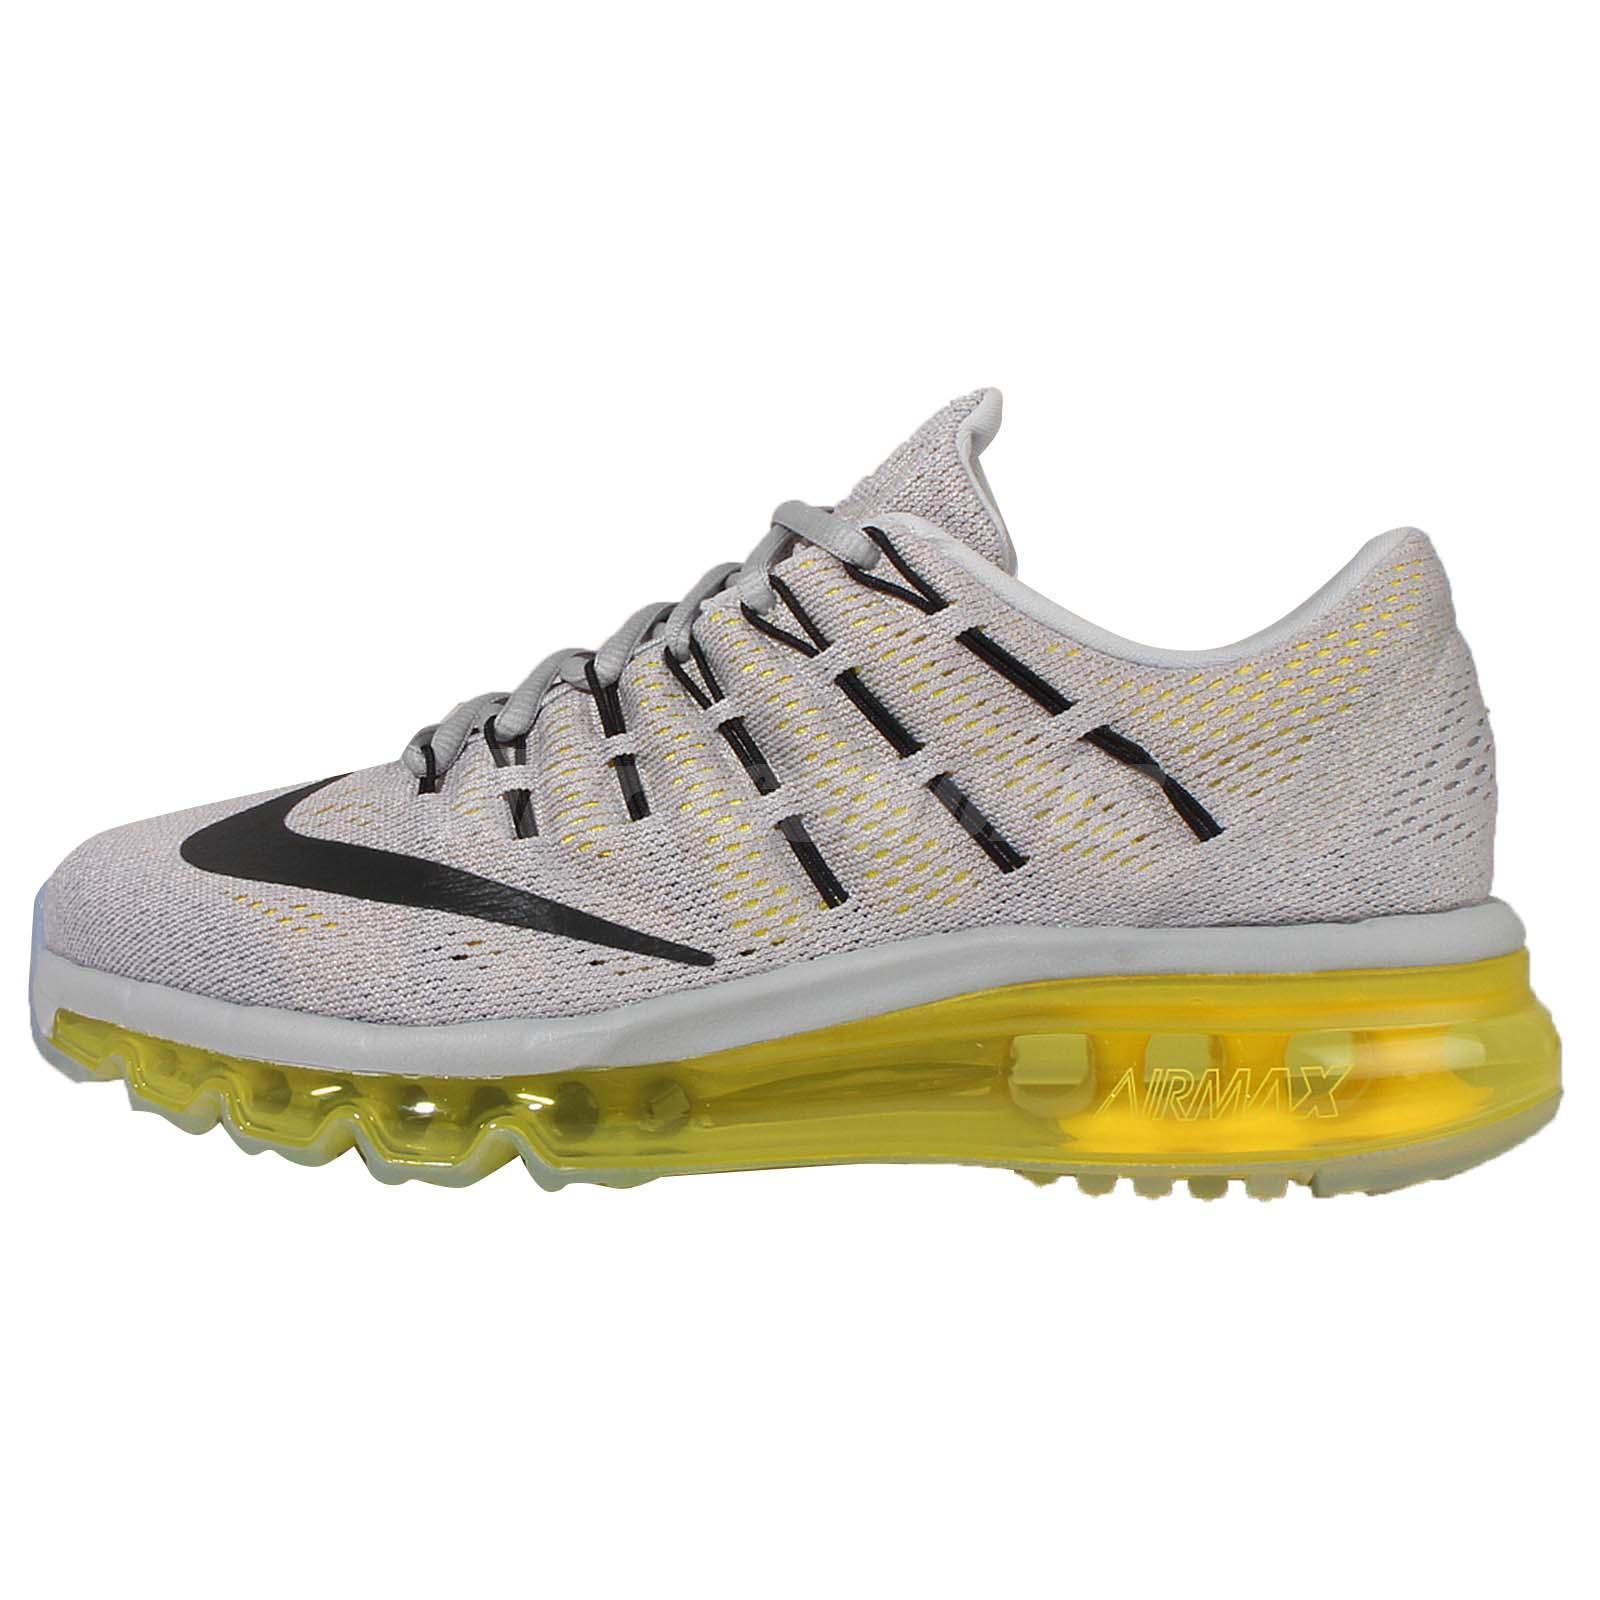 25b229c520a ... reduced nike air max 360 running shoe 87520 ccbee